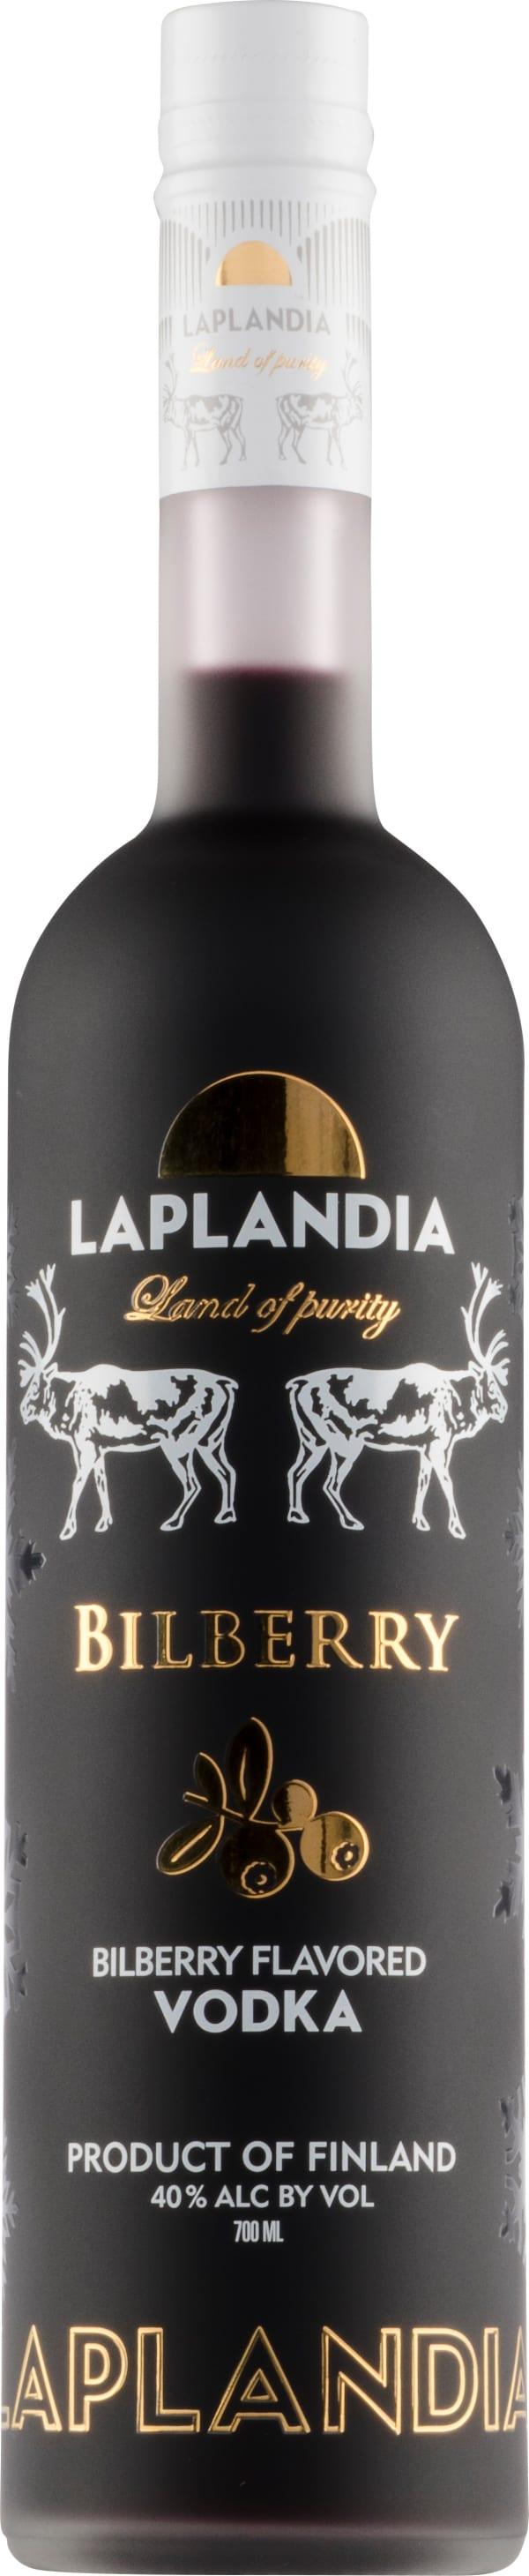 Laplandia Bilberry Vodka